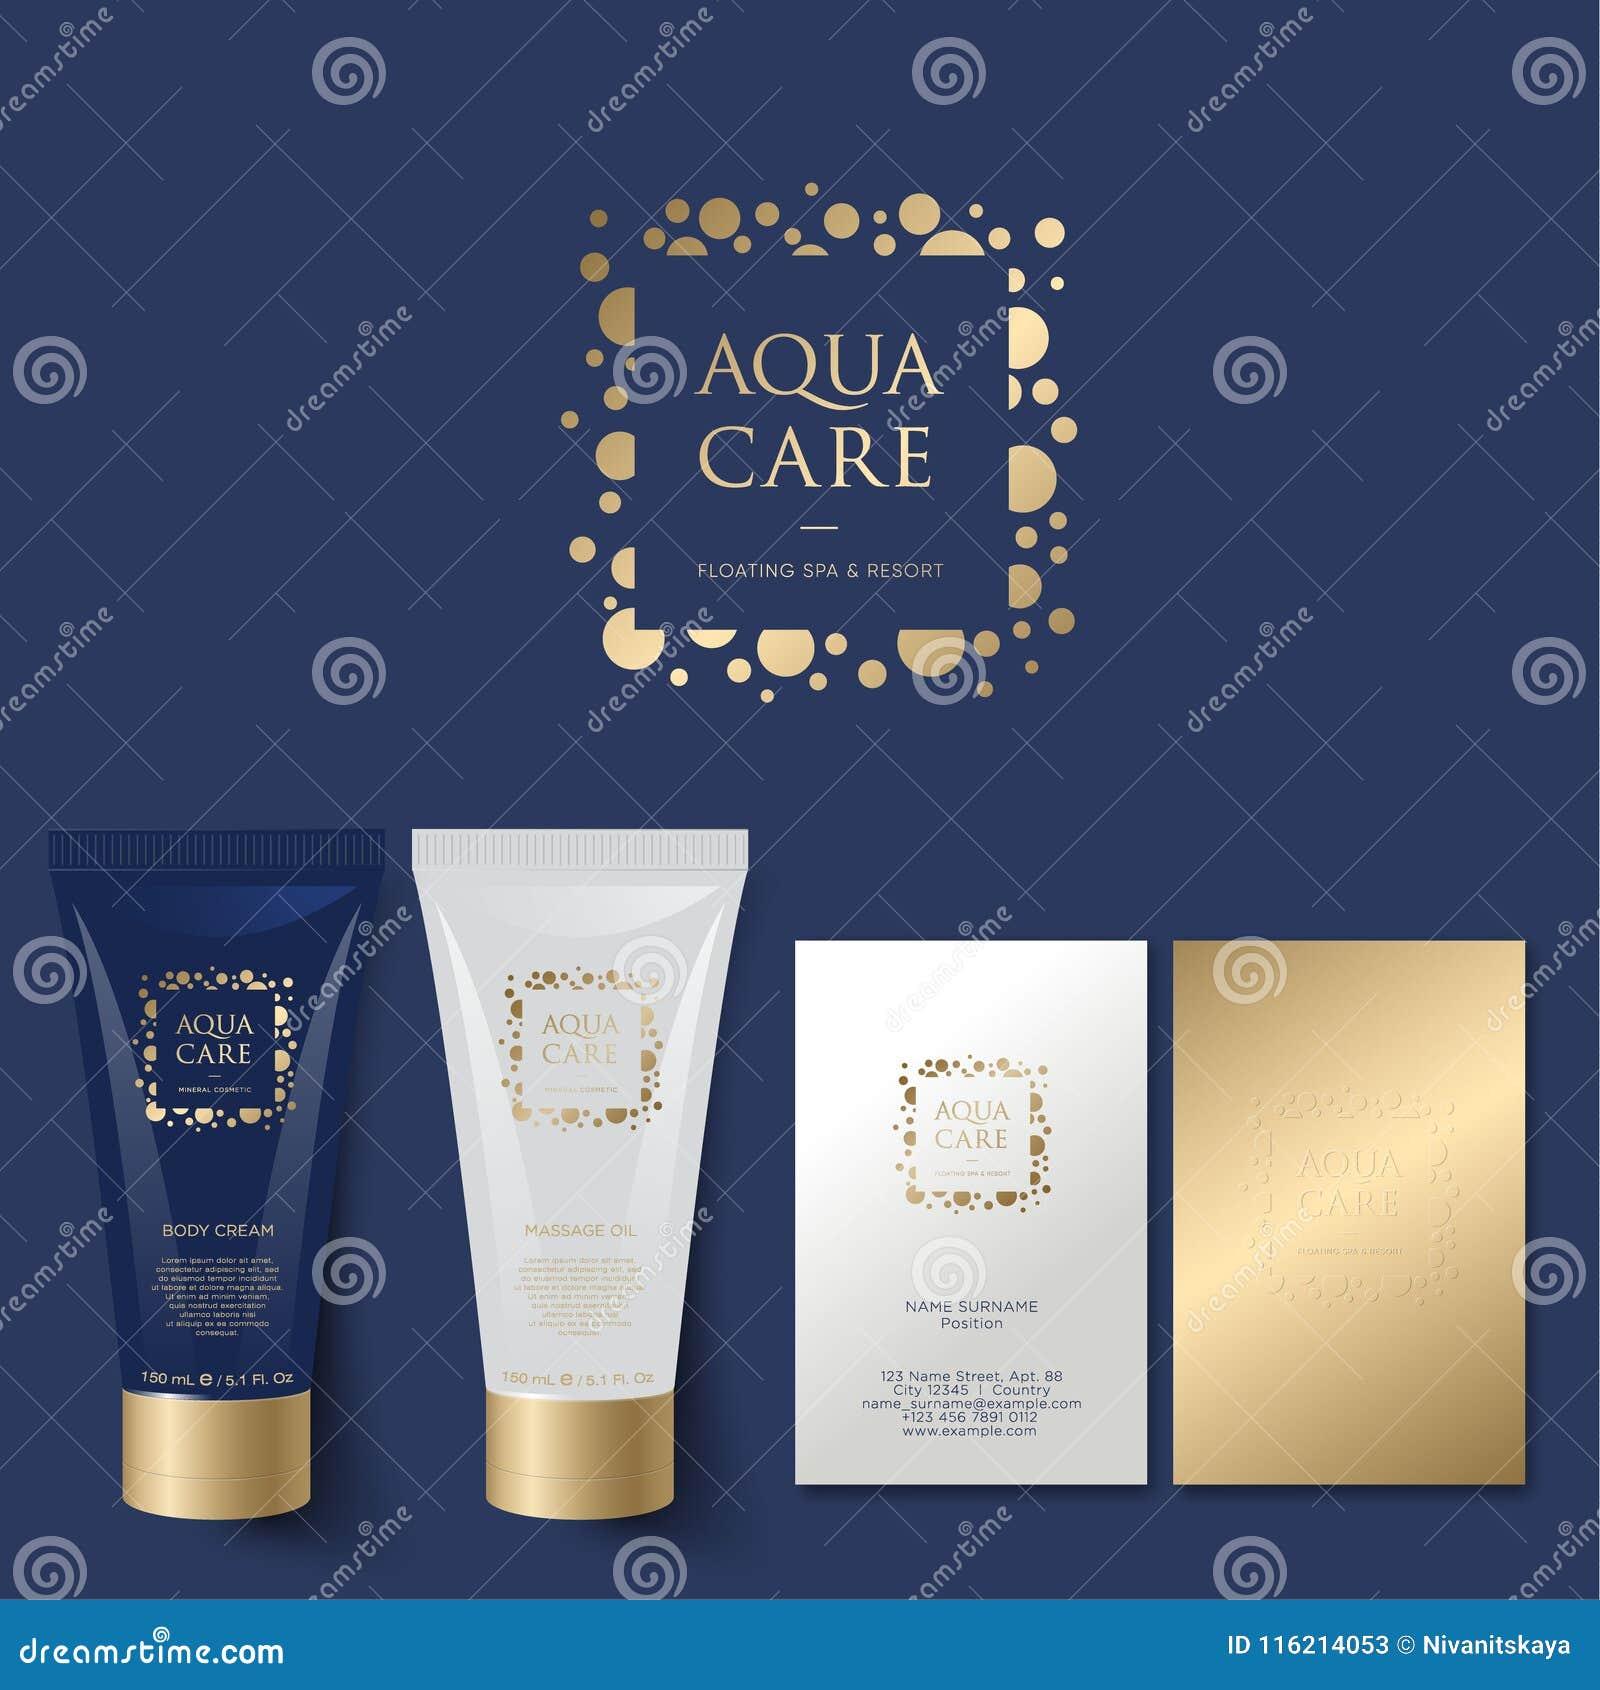 Aqua Care logo. Spa emblem. Mineral natural cosmetics logo. Identity. Tubes and business card